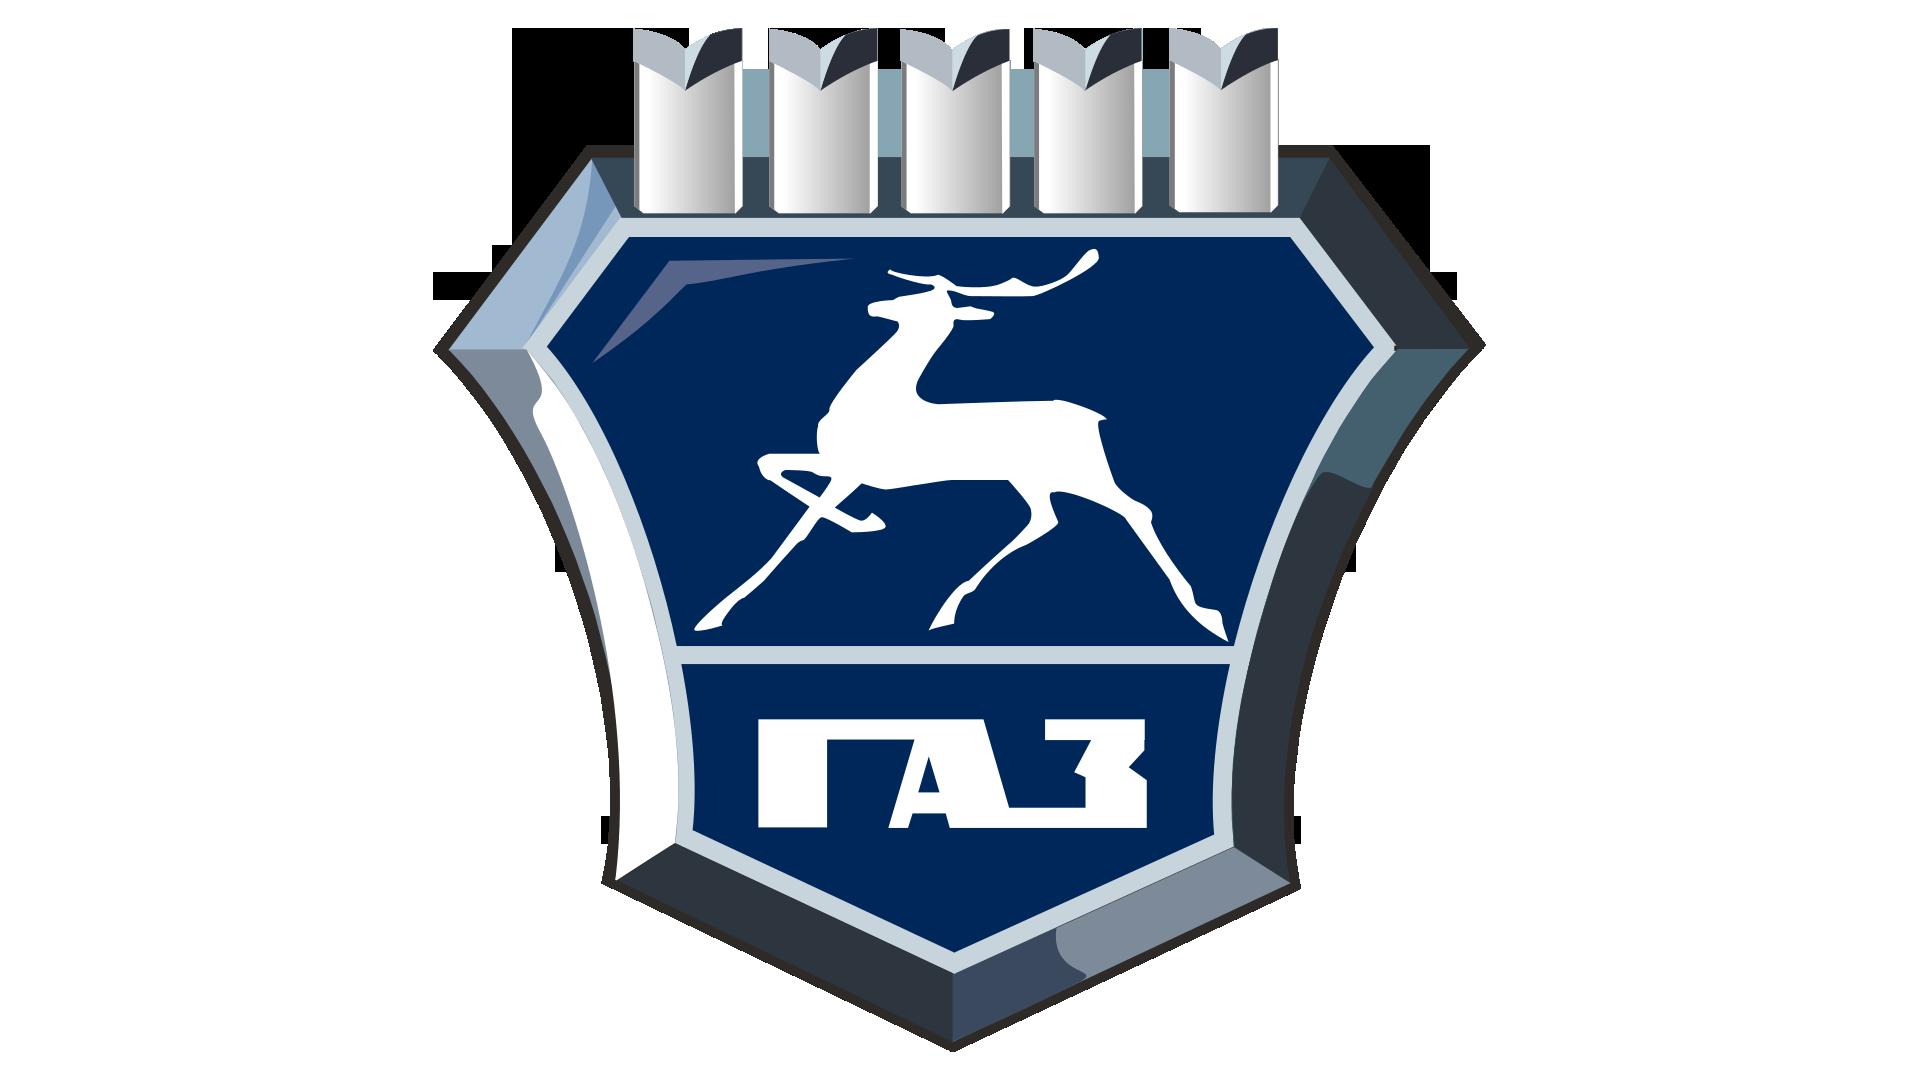 Gaz Logo Hd 1080p Png Information